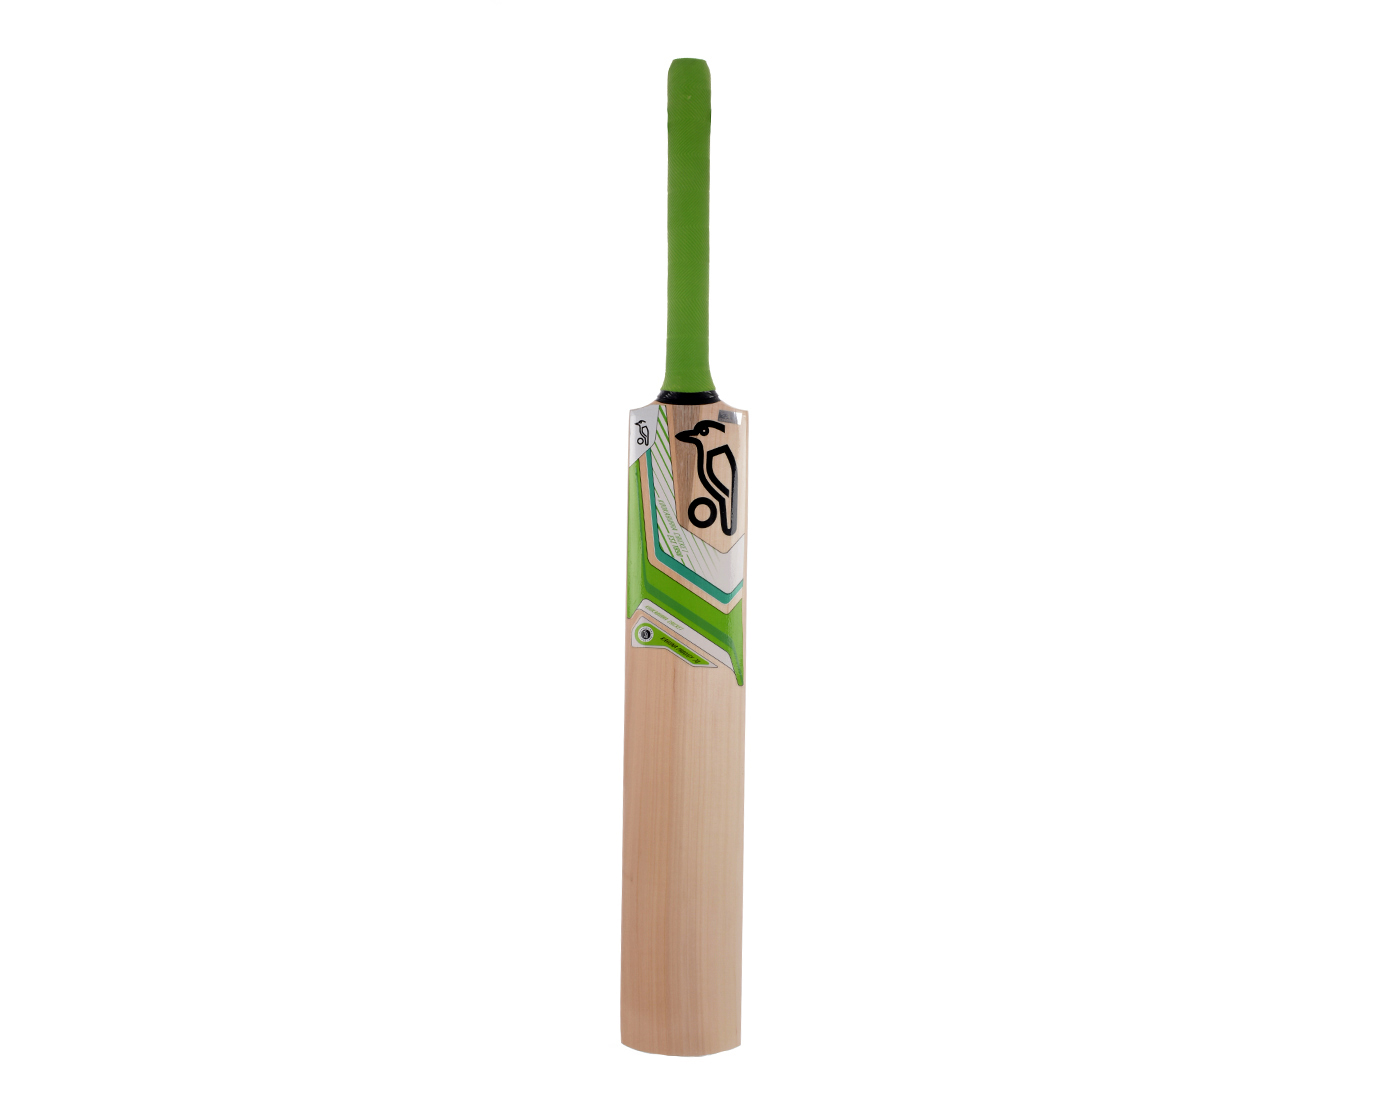 Kookaburra Kahuna Pro 70 SH Cricket Bat